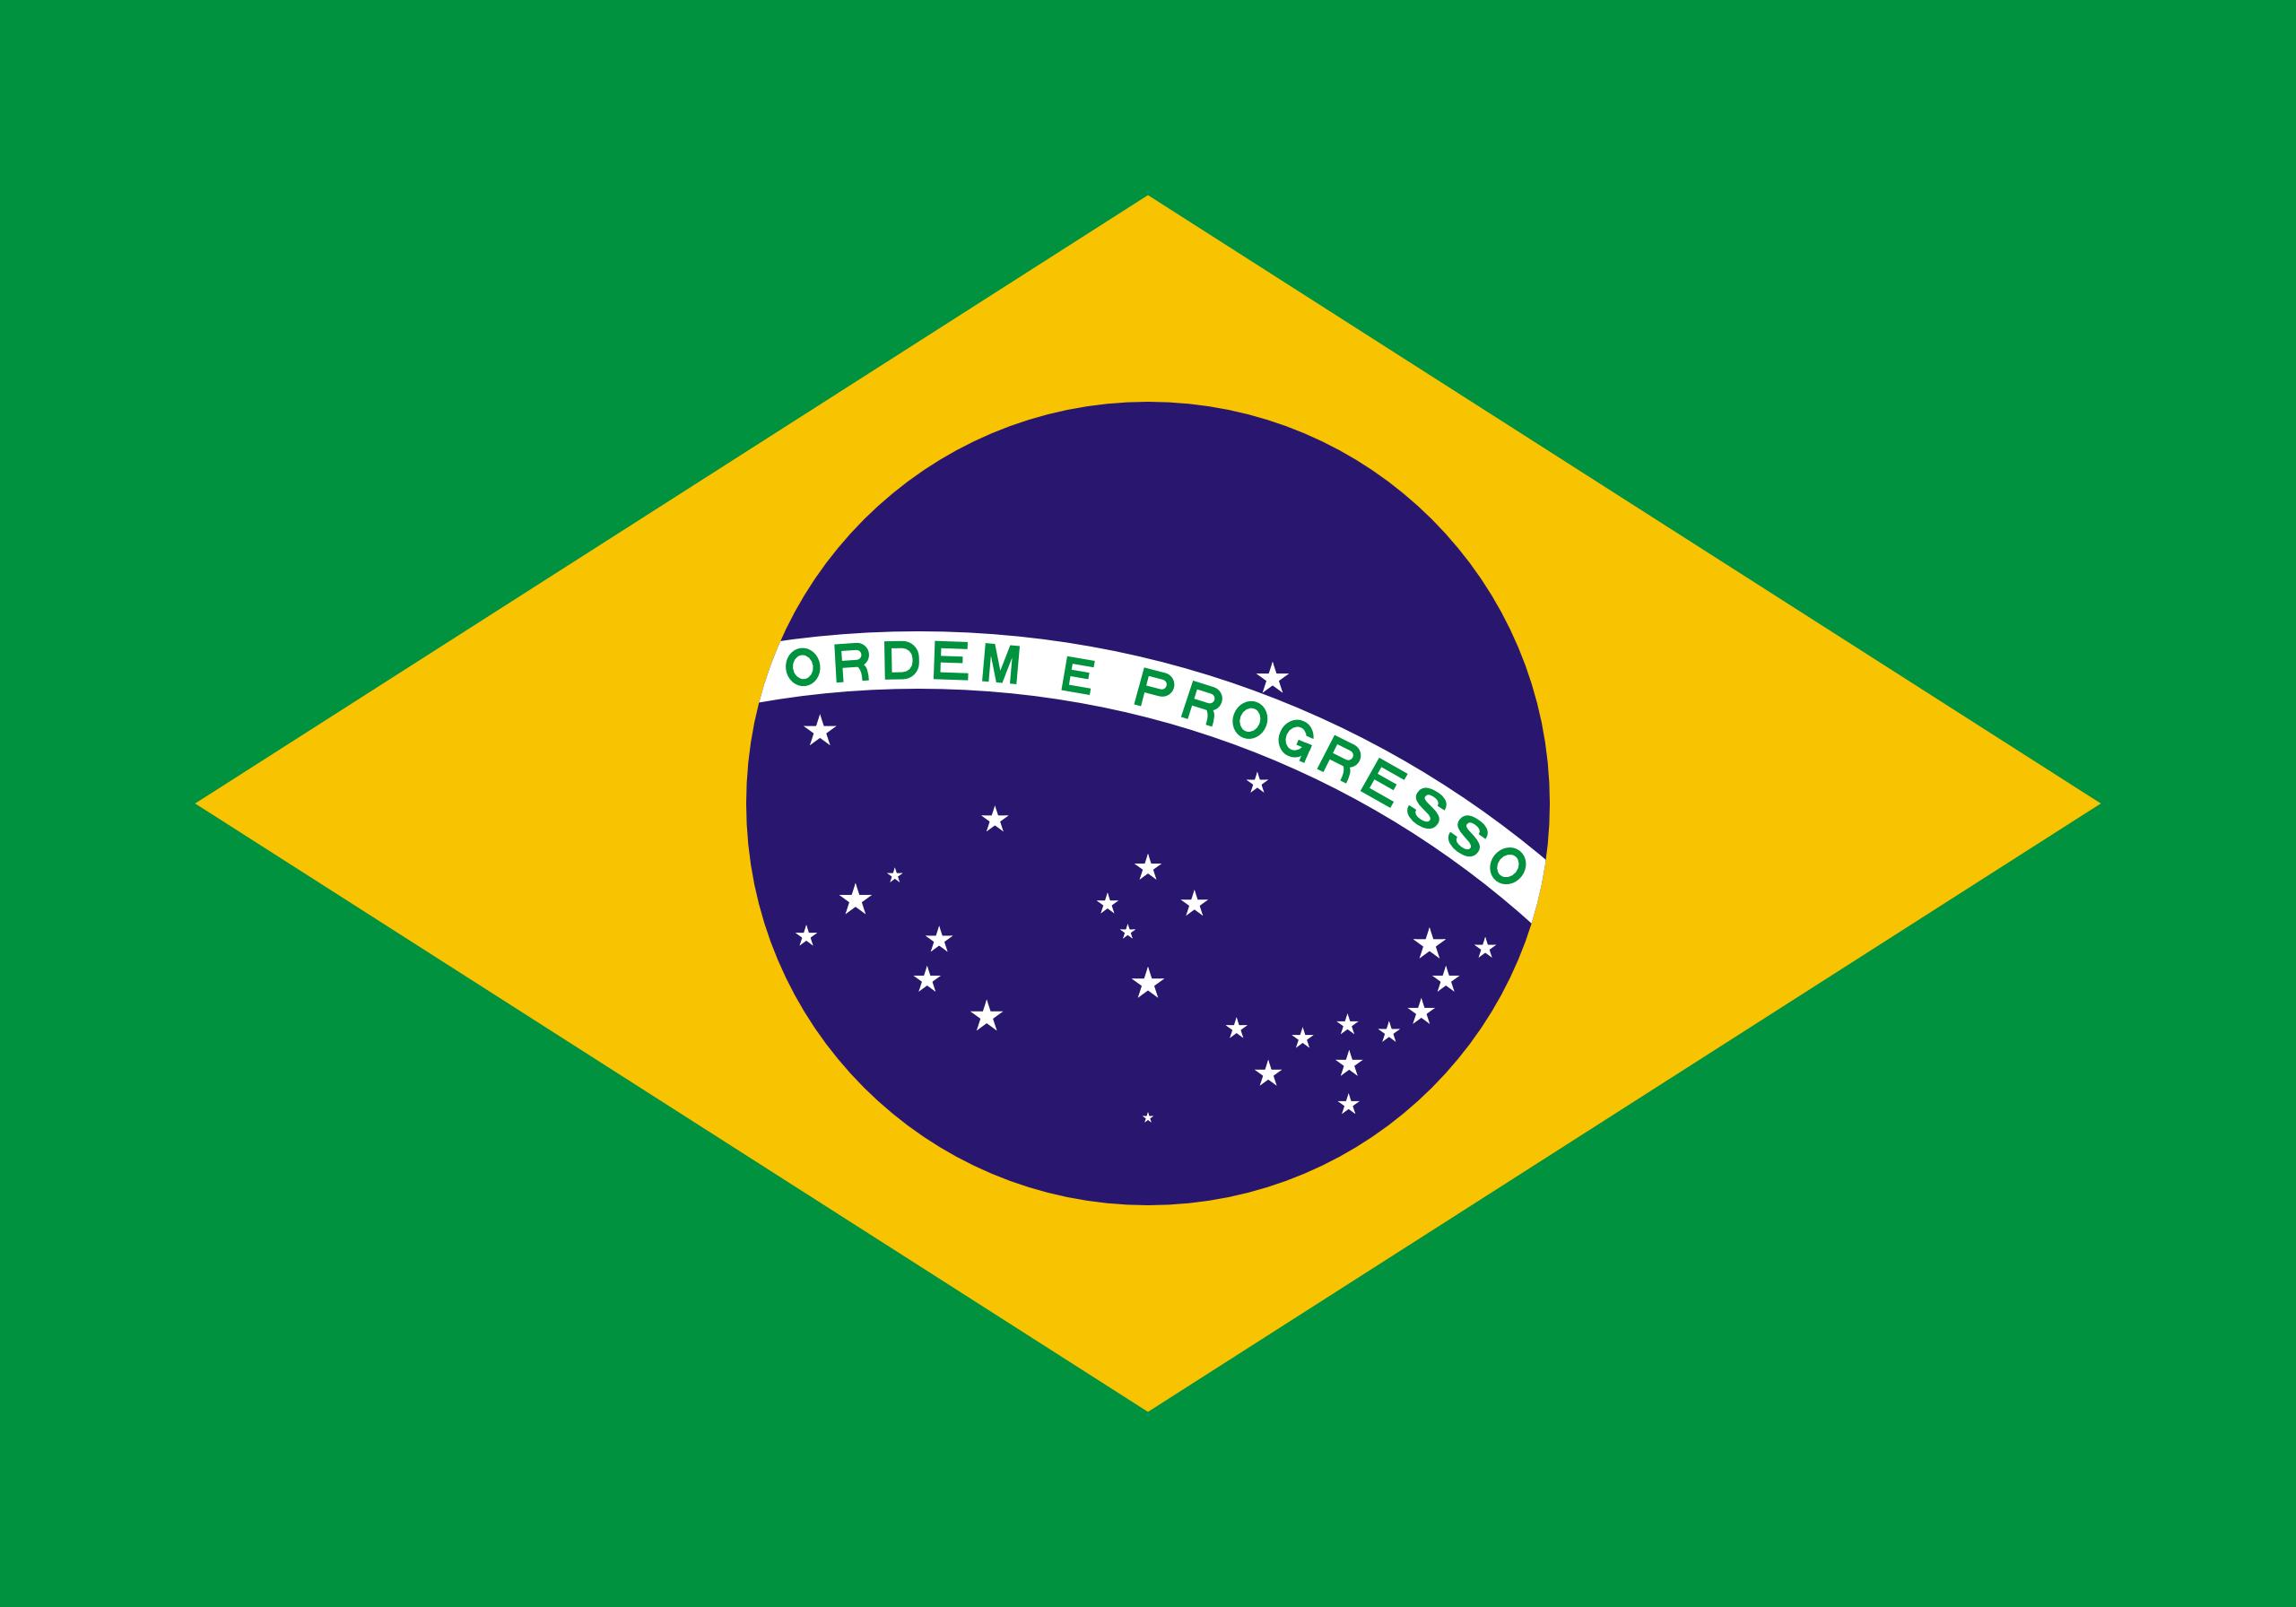 Brésil, pays, emblème, logo, symbole - Fonds d'écran HD - Professor-falken.com